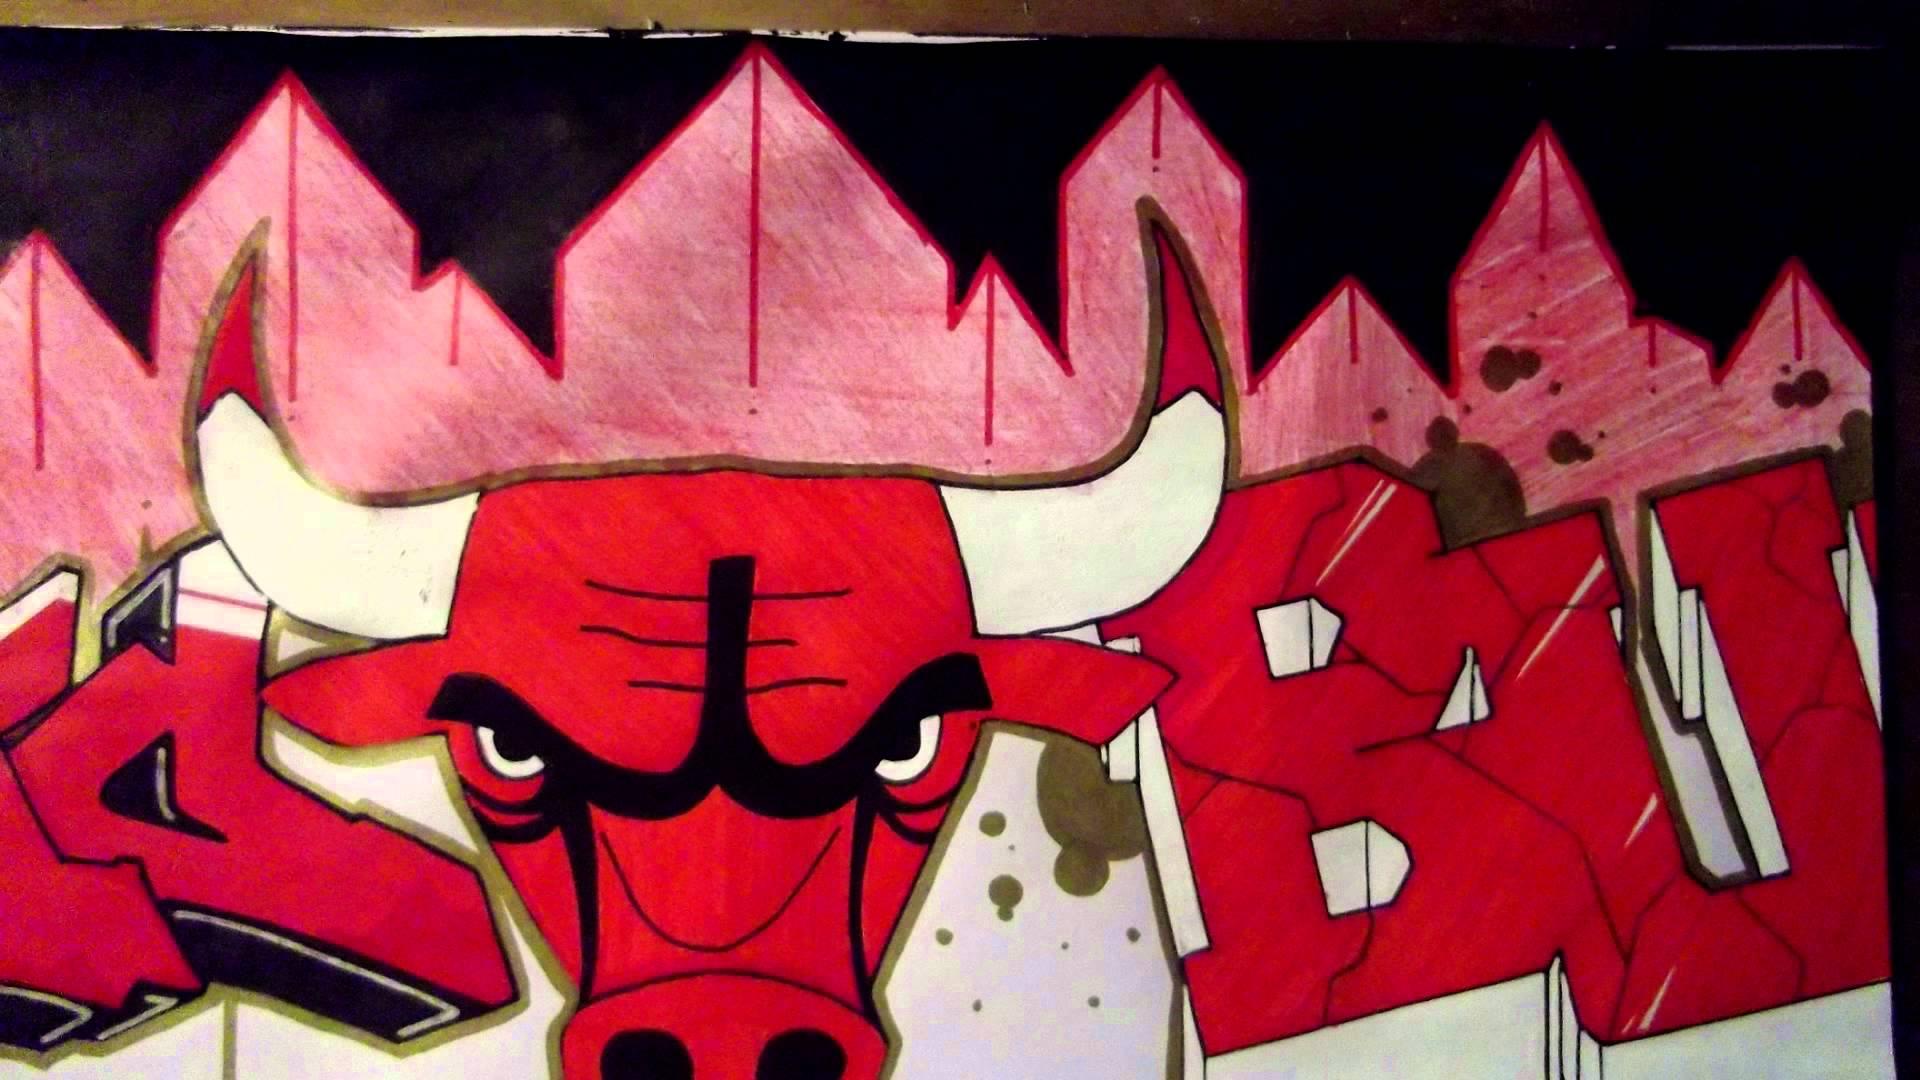 Drawn cattle graffiti #4